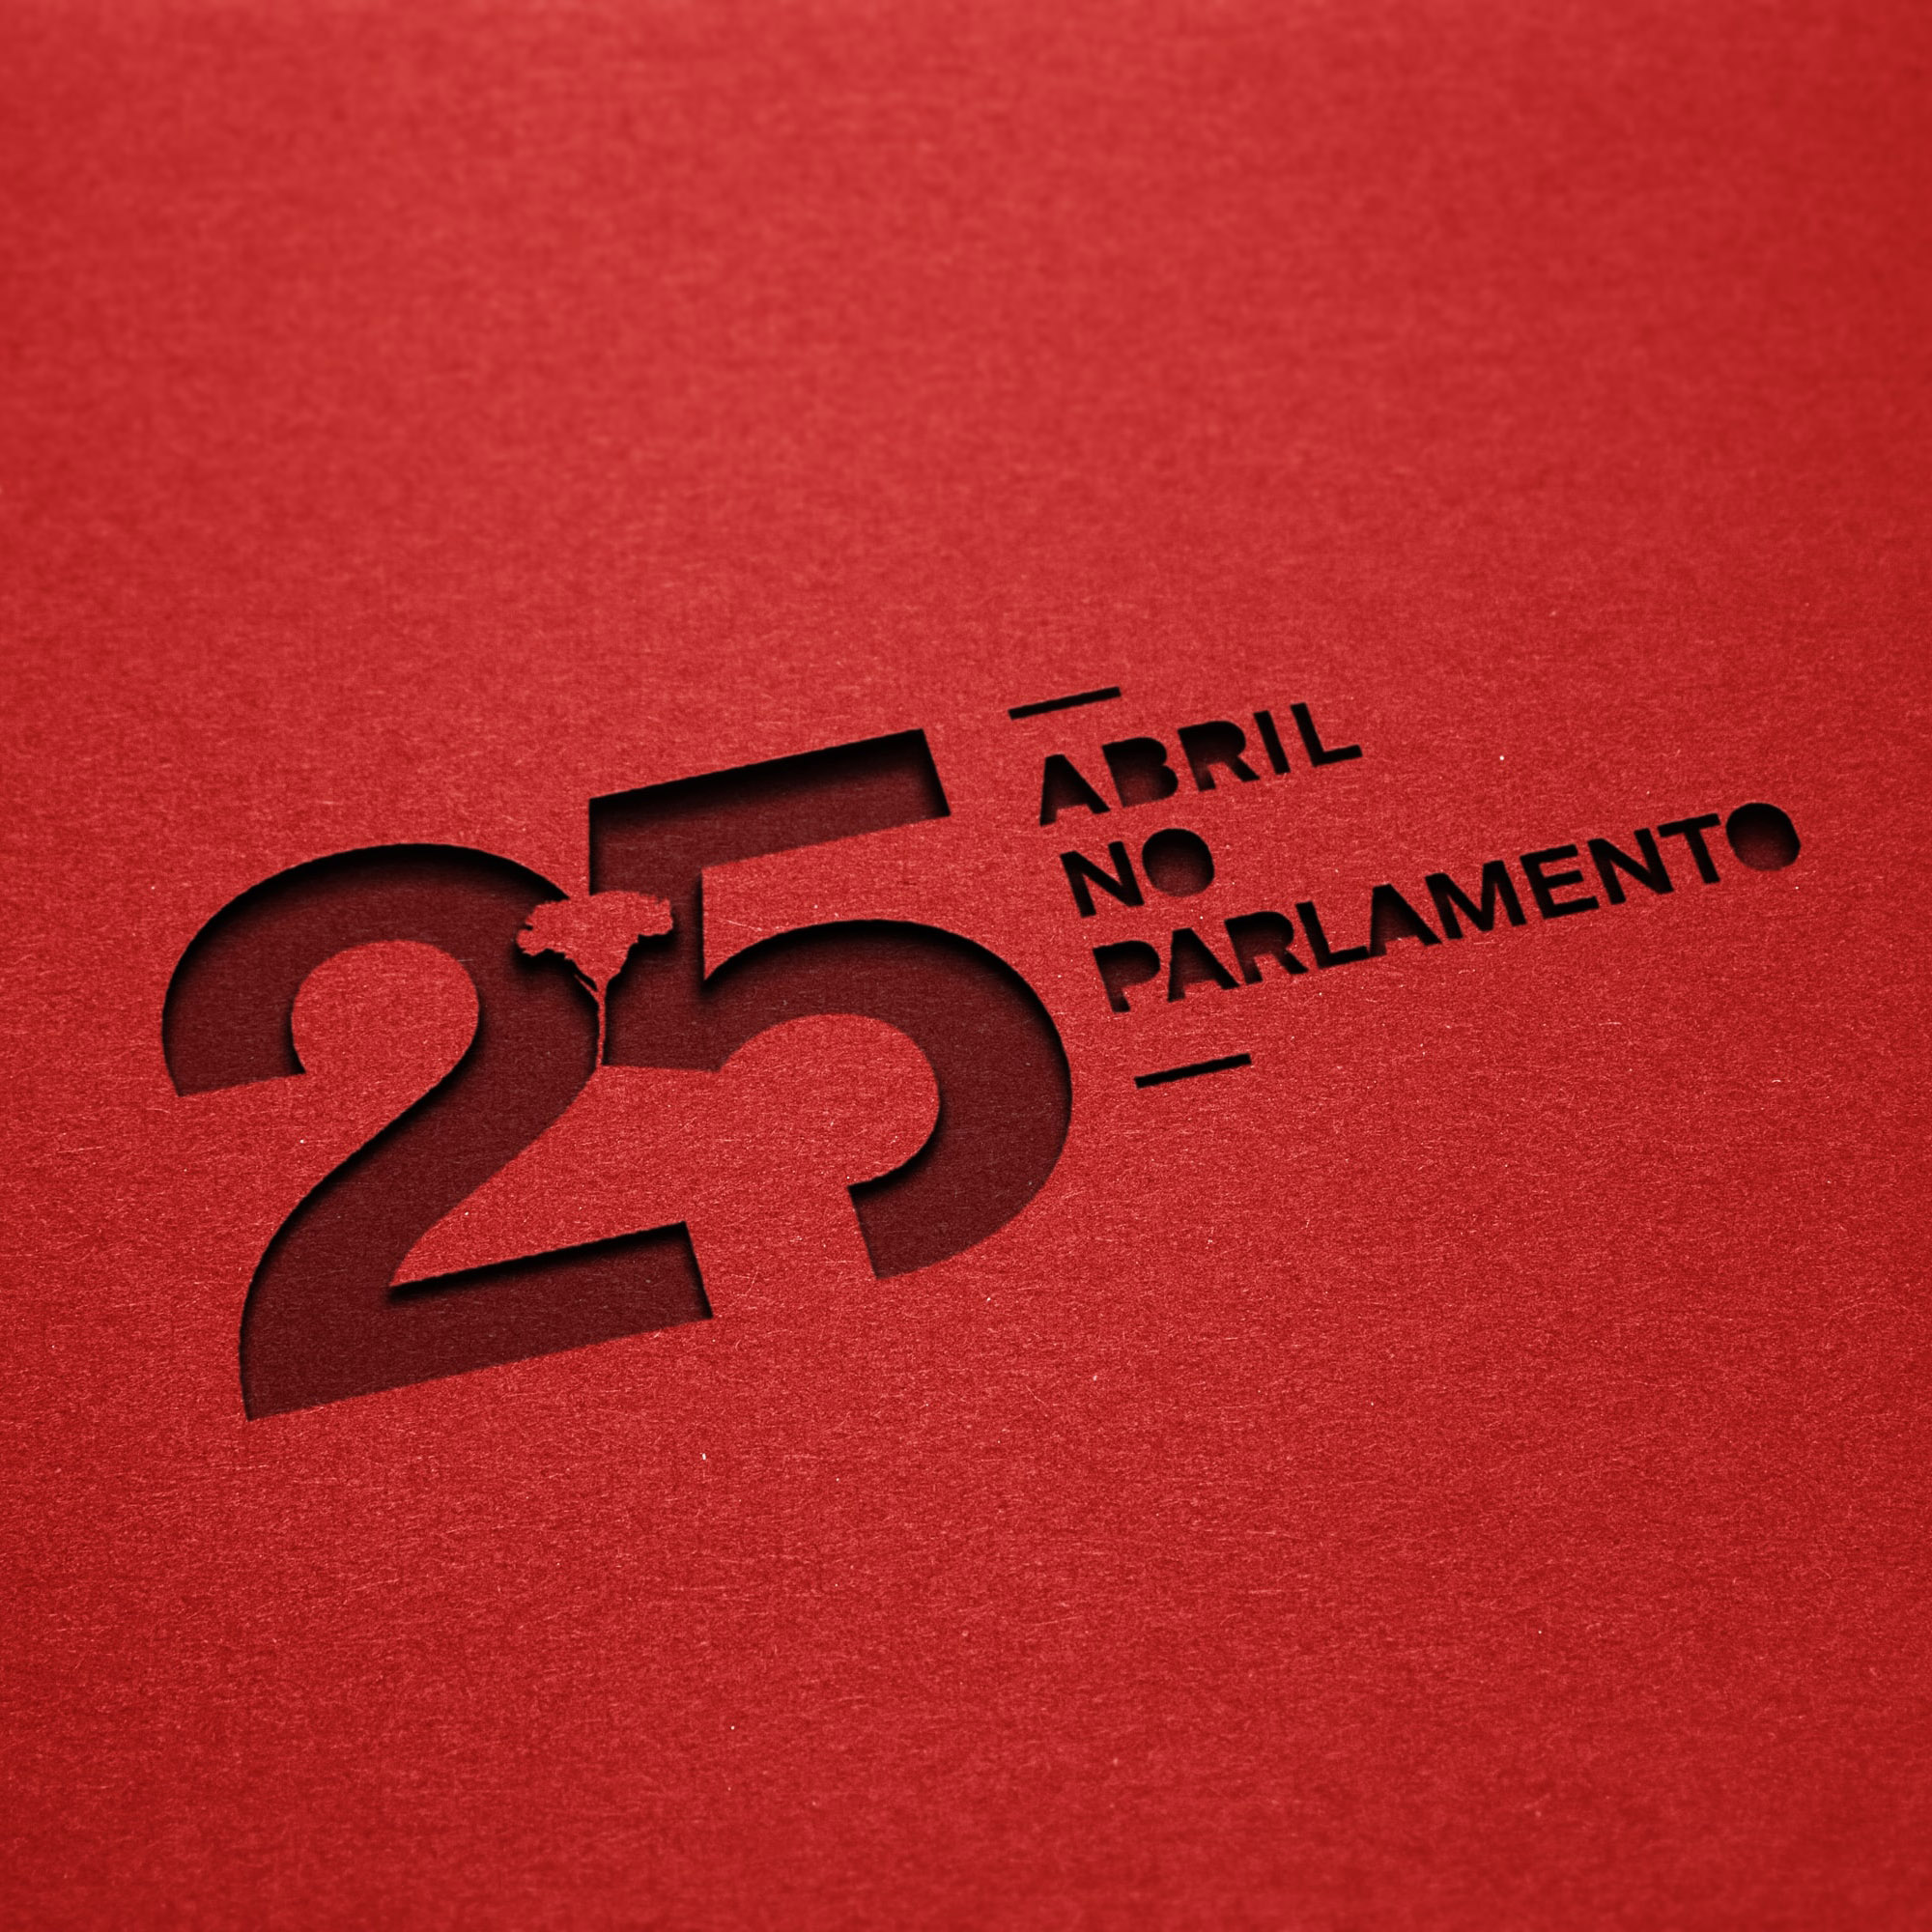 April 25th Identity